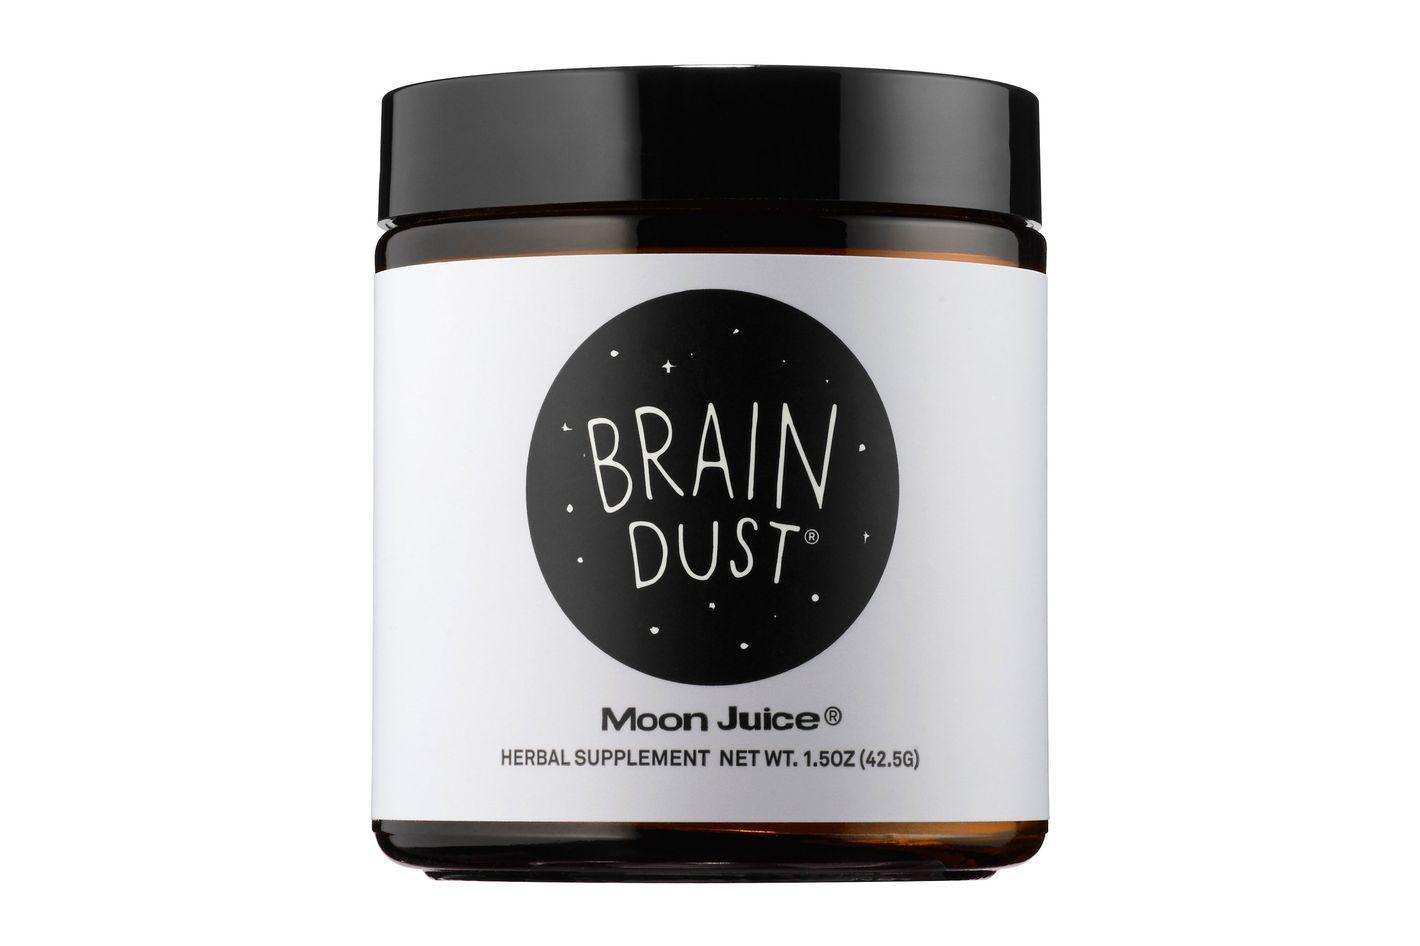 MOON JUICE Brain Dust®